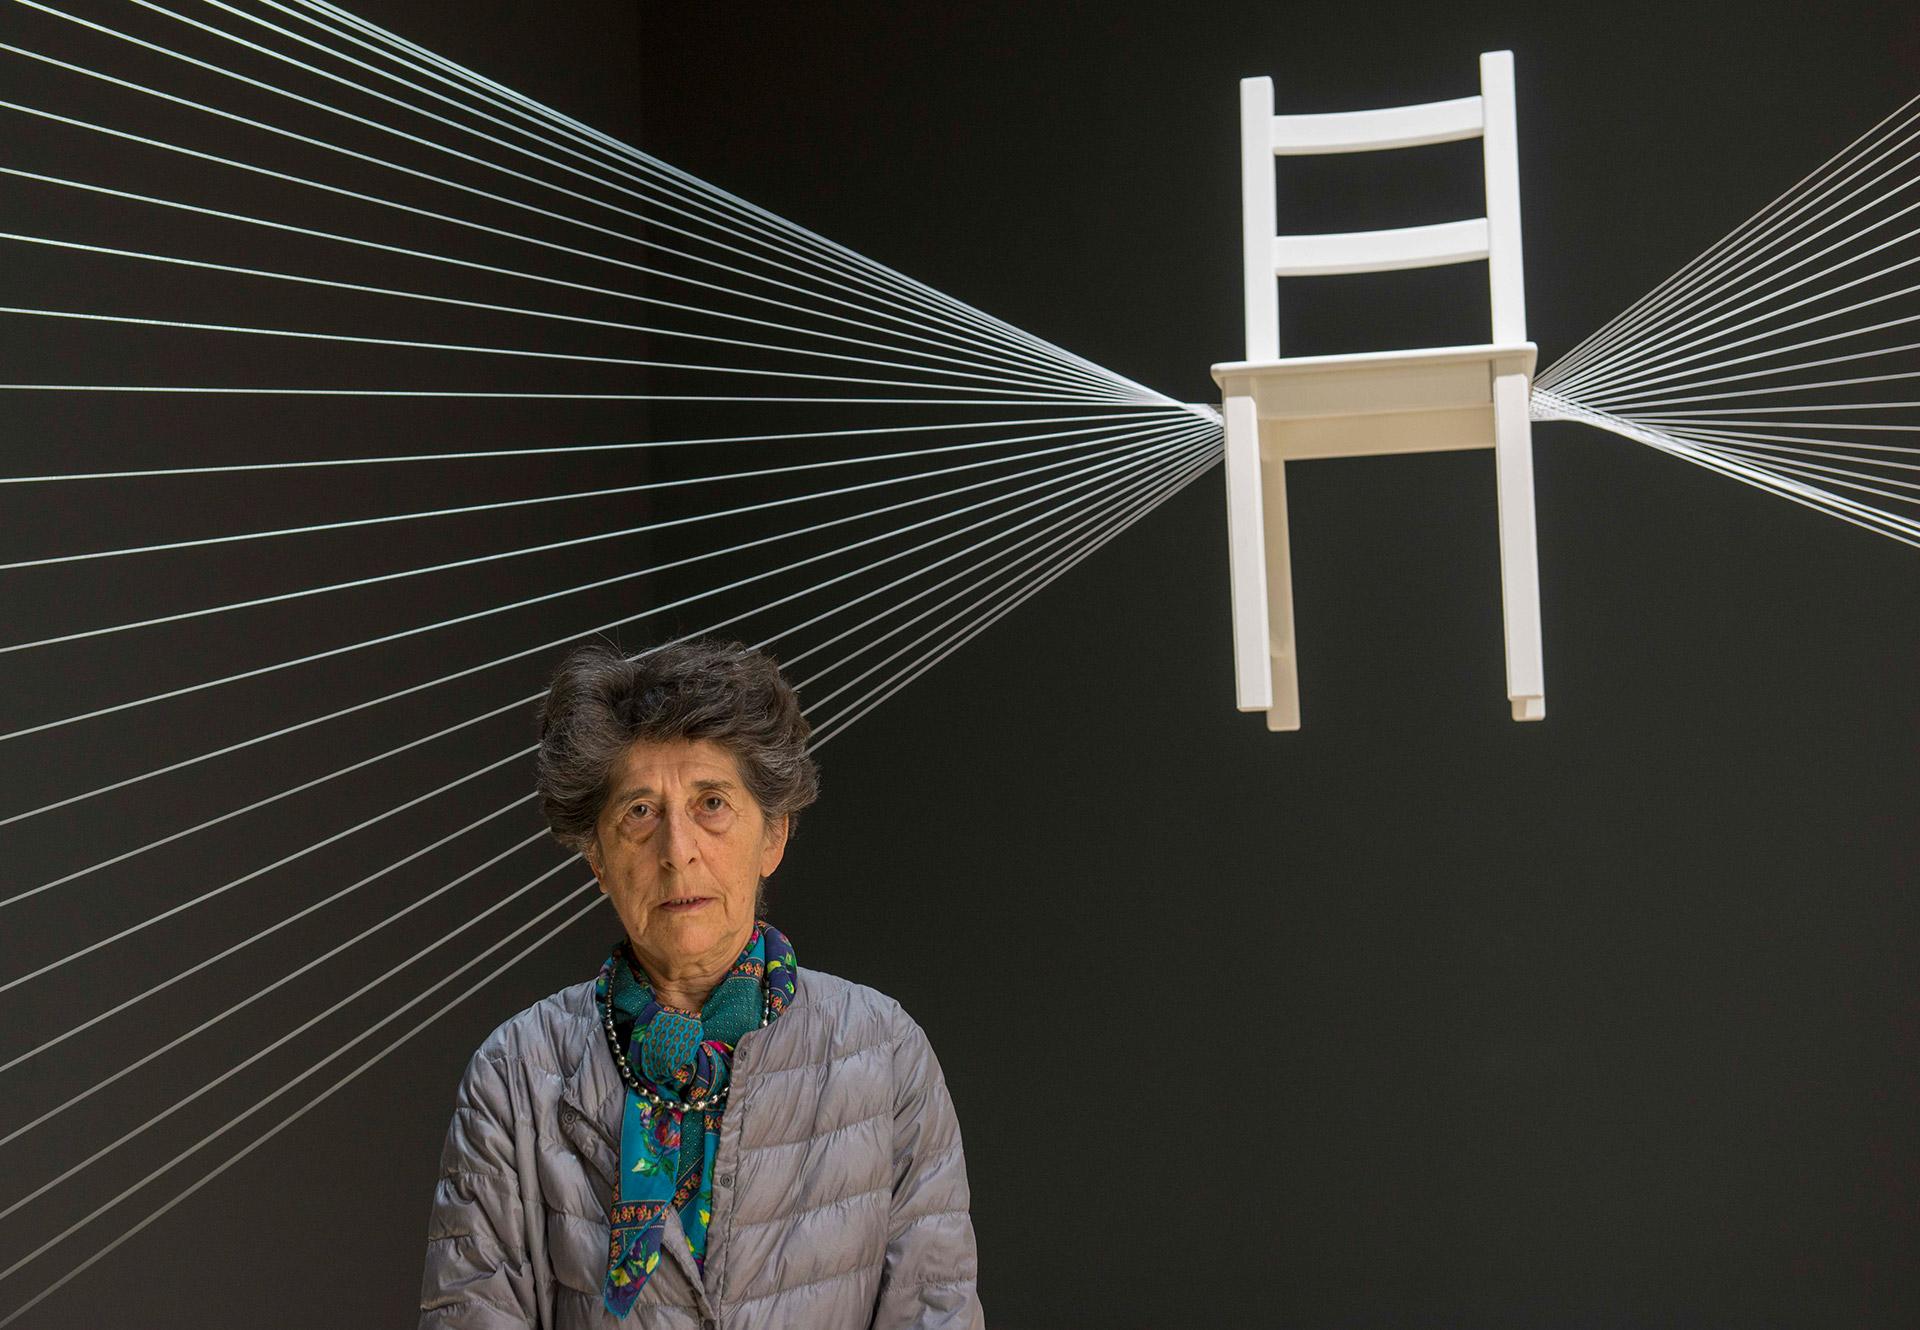 Esther Ferrer Artistas | Guggenheim Bilbao Museoa